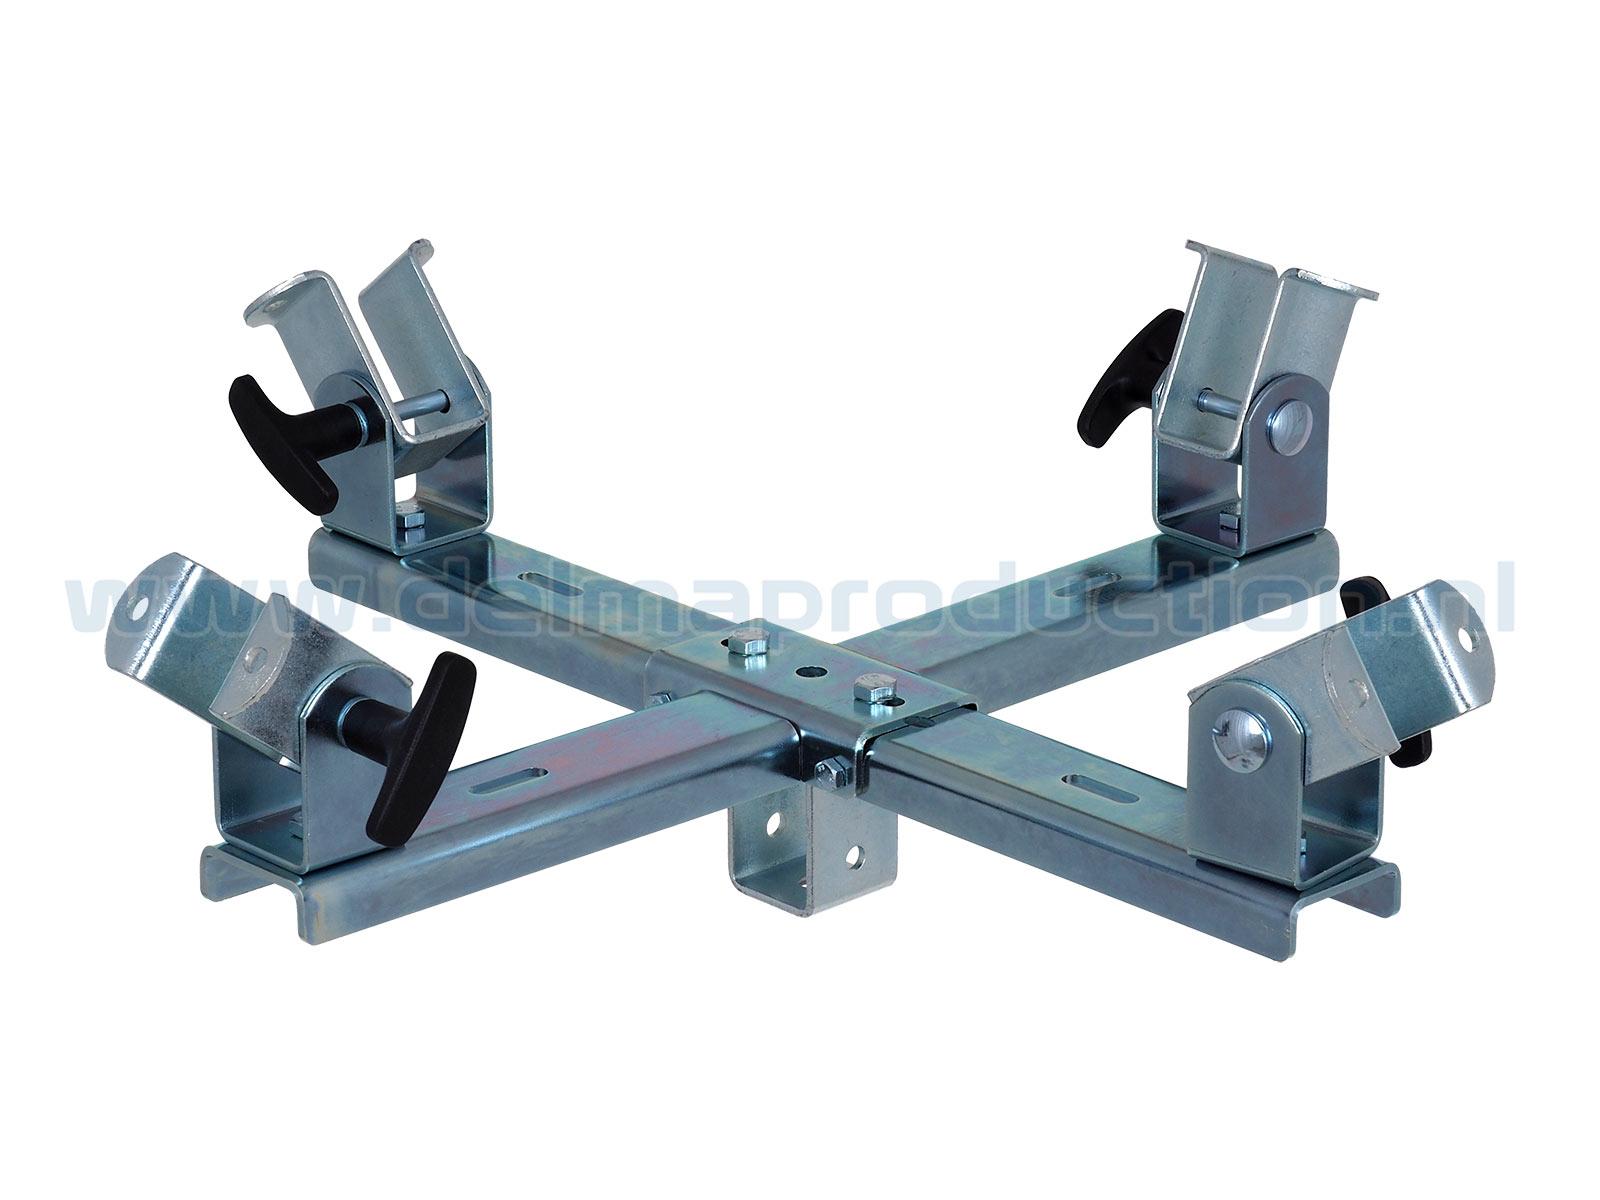 Quattro mounting bracket for Tripod fit